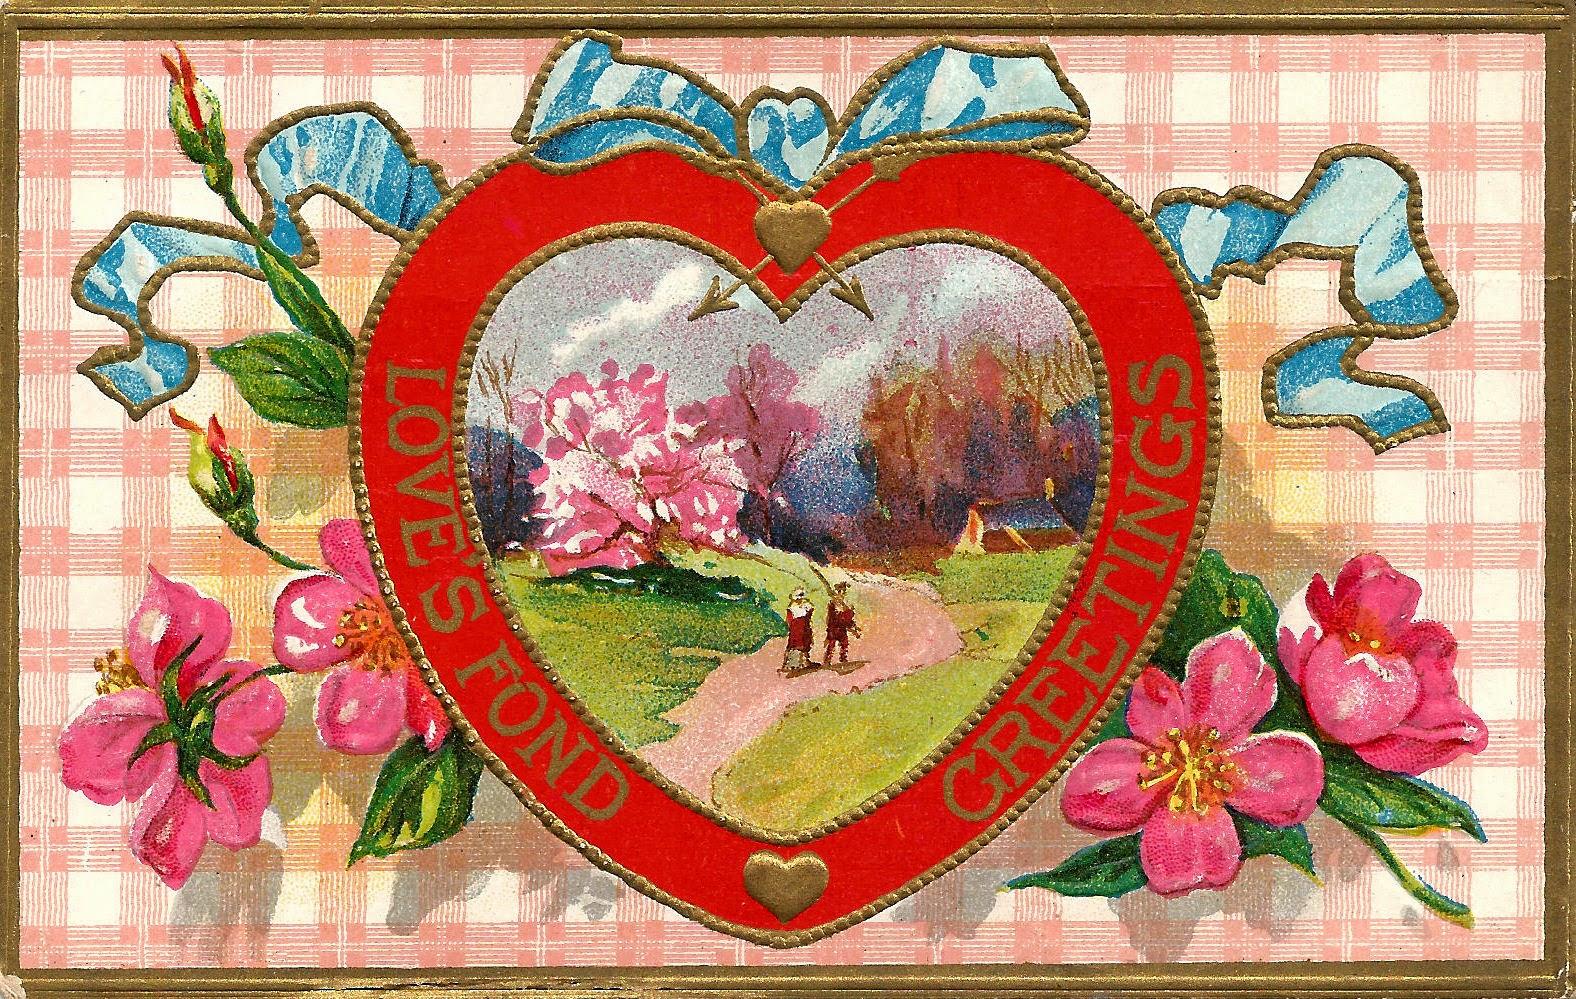 http://3.bp.blogspot.com/-gUuQ6CHMYp8/VKw9-I-yXaI/AAAAAAAAU0I/HpB1fDG5M6o/s1600/scrap_valentine_heart_frame_gm_2.jpg